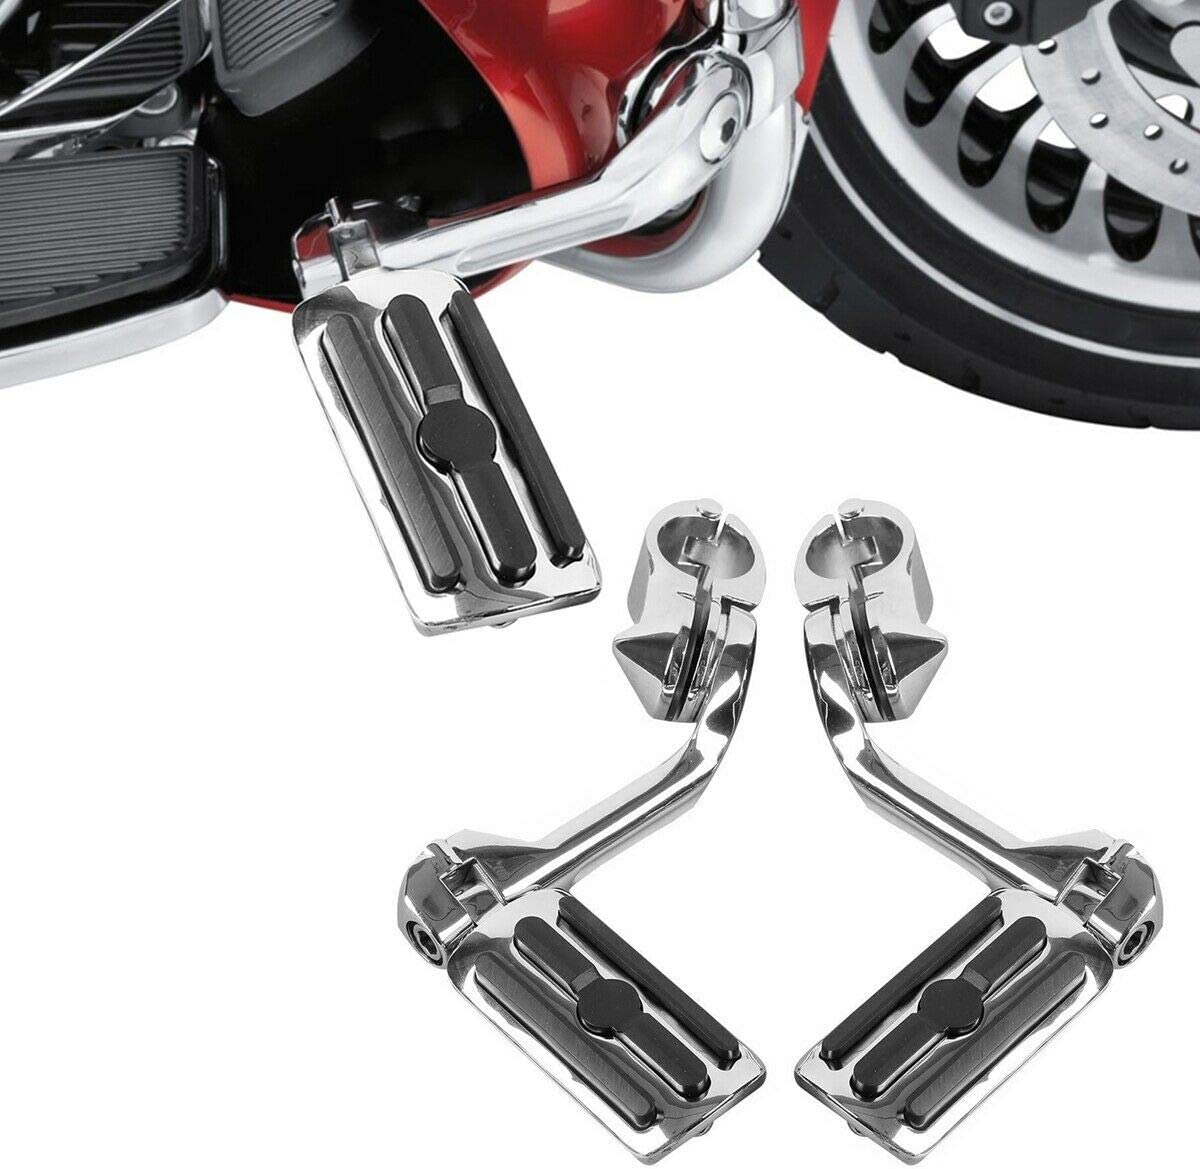 TCMT Black Footrest Foot Pegs 1-1//4 Short Angled Mount Fit For Harley Davidson Touring Road Glide Electra Glide Road King Street Glide